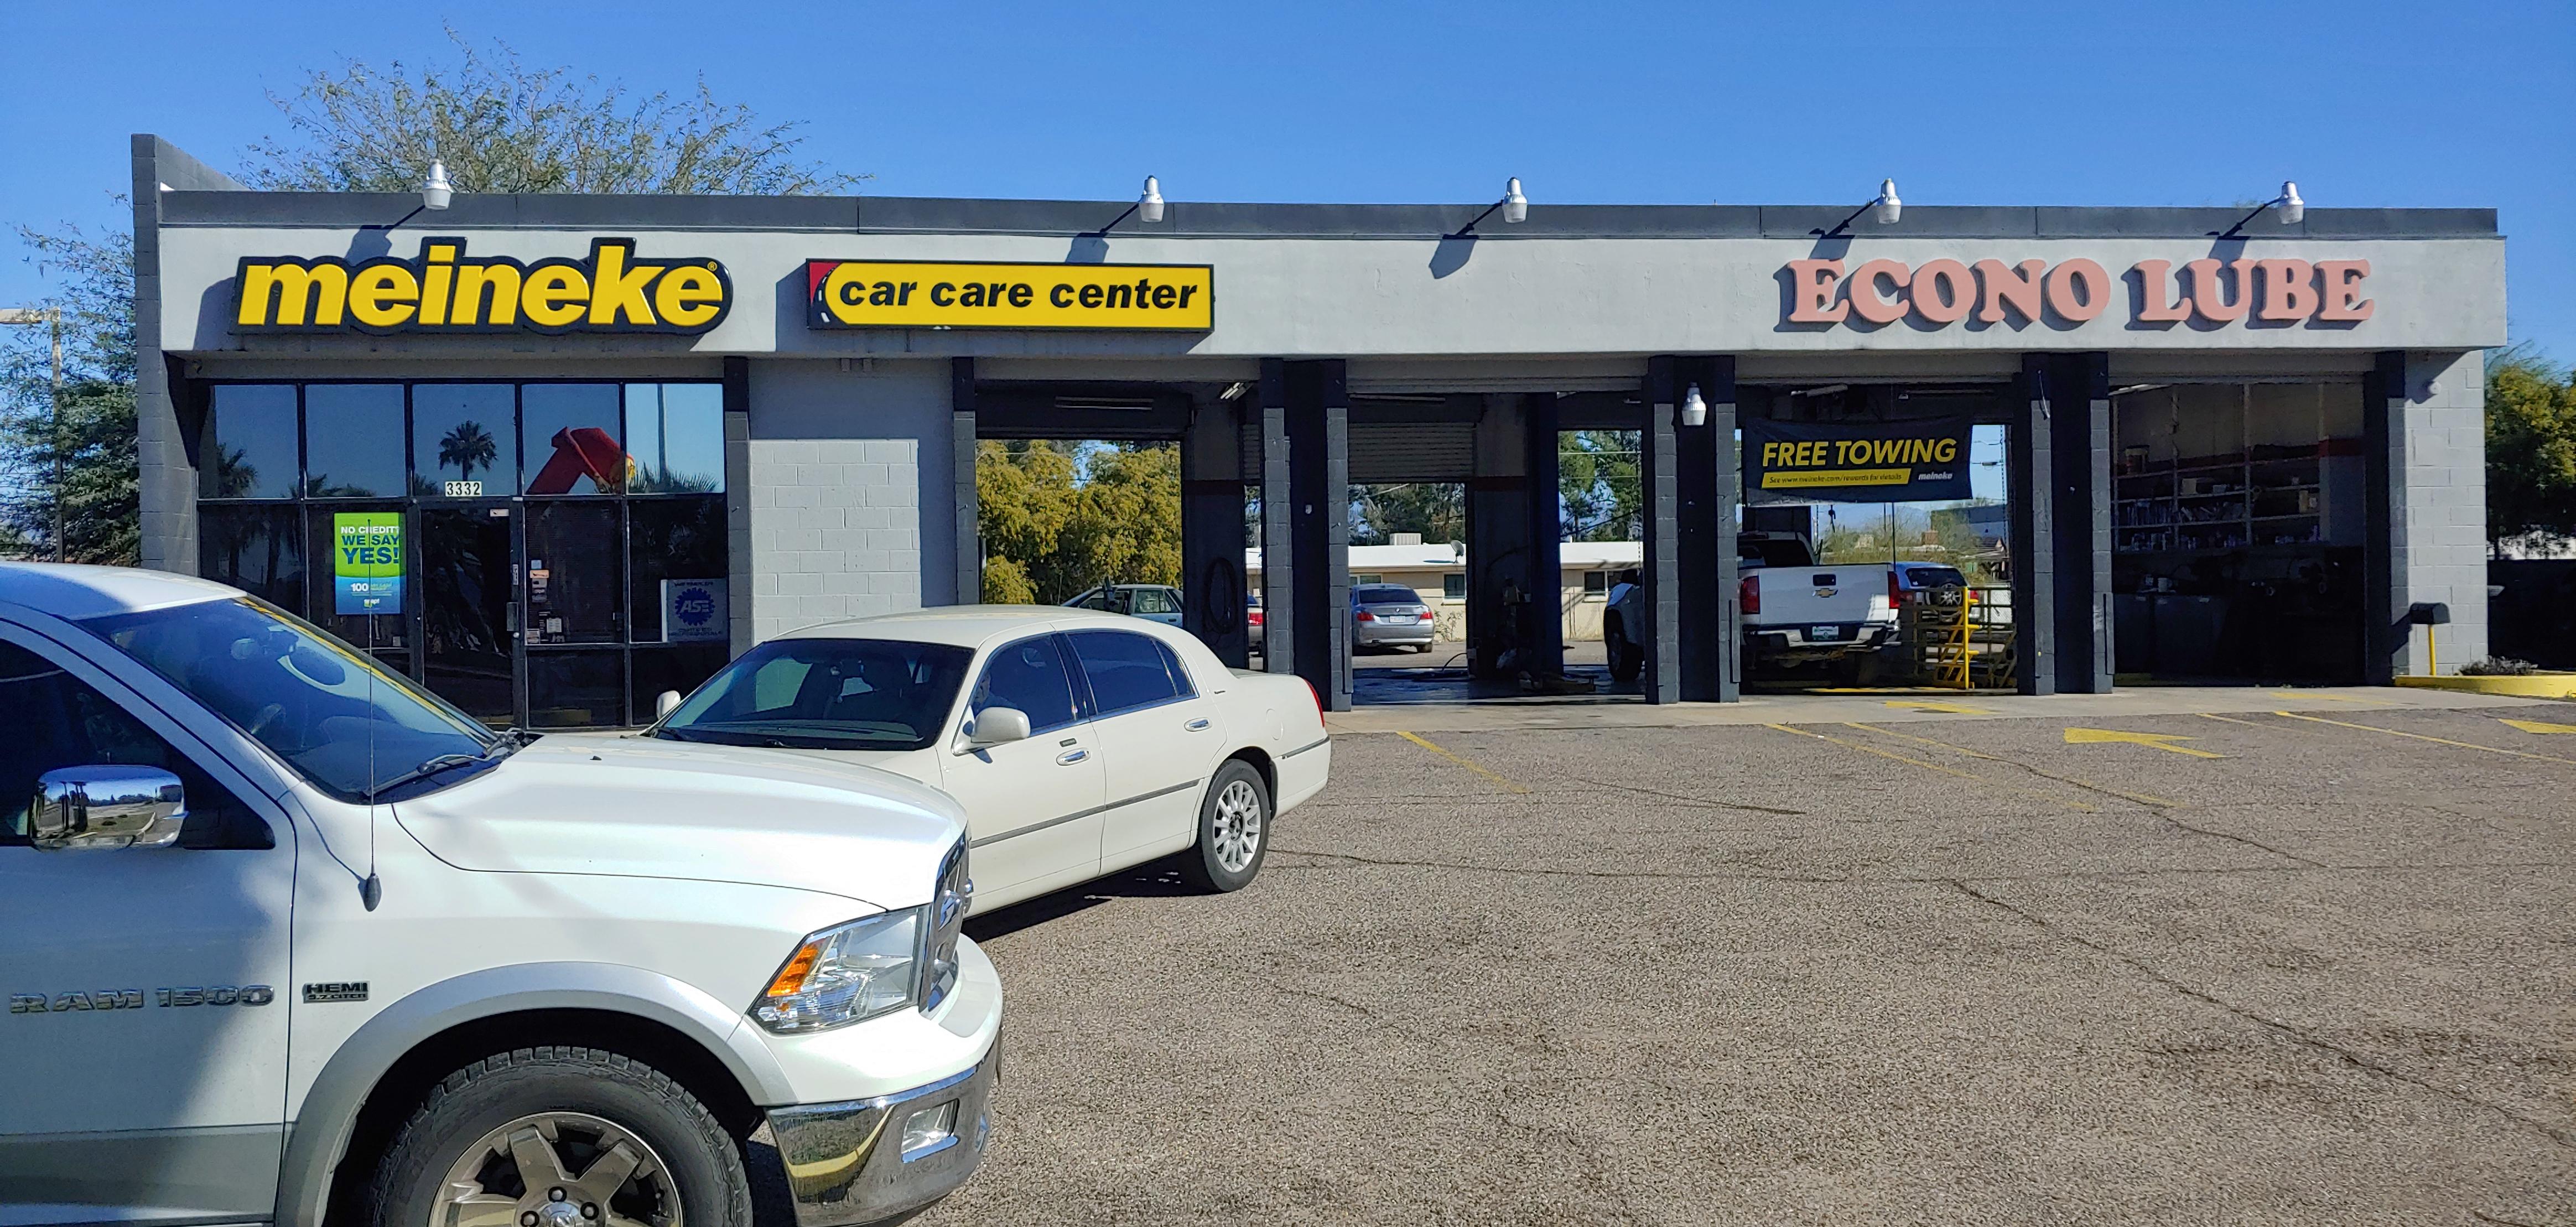 Meineke Car Care Center Coupons near me in Tucson, AZ ...